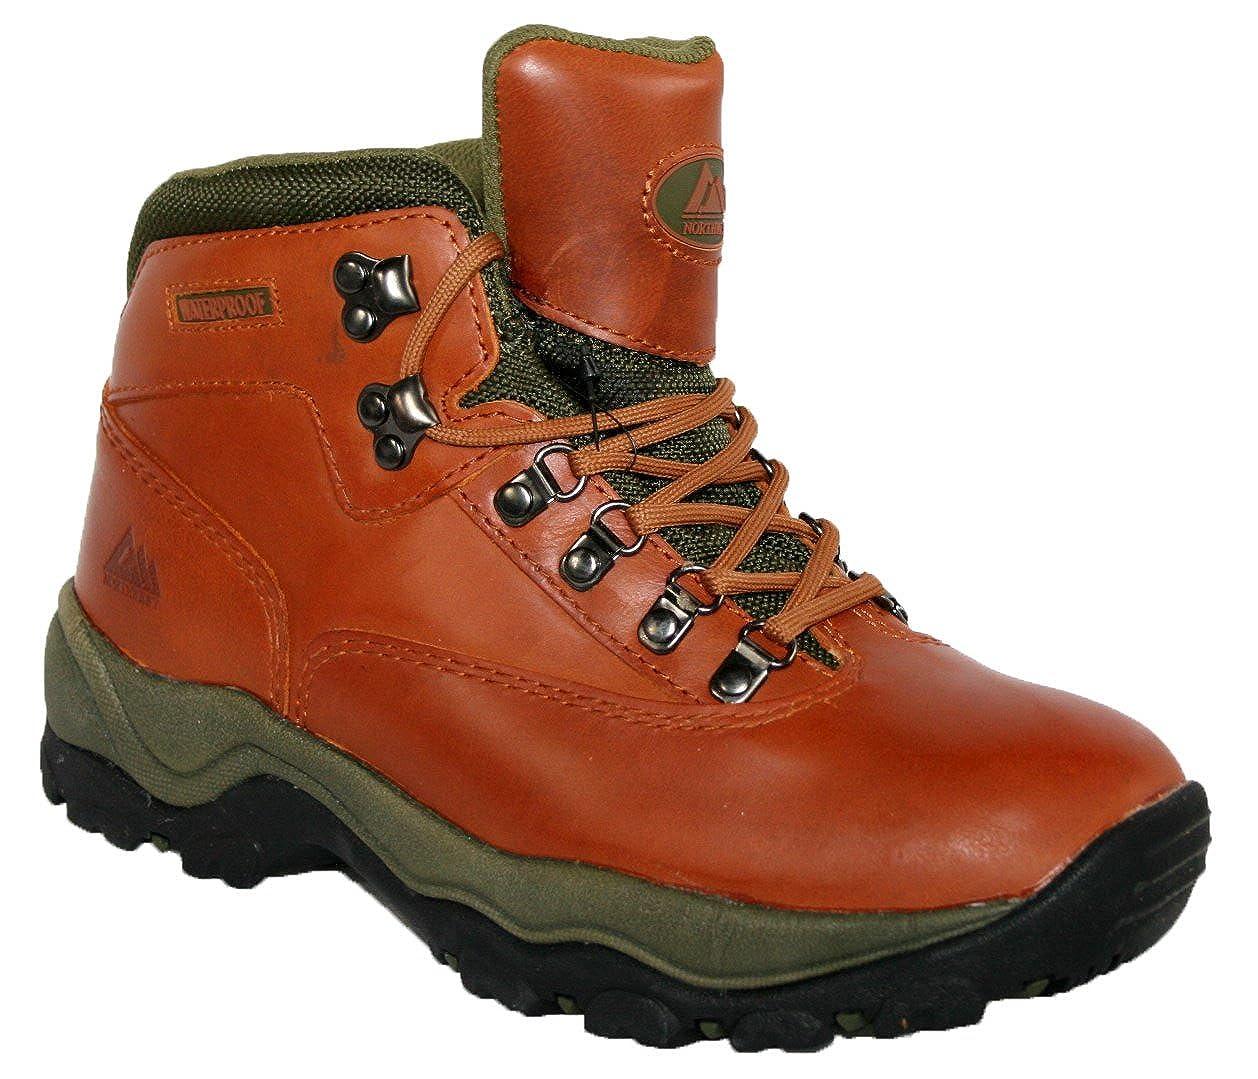 3a289565481 LADIES PEAK LACE UP PREMIUM LEATHER UPPER WATERPROOF WALKING HIKING  TREKKING BOOT  Amazon.co.uk  Clothing